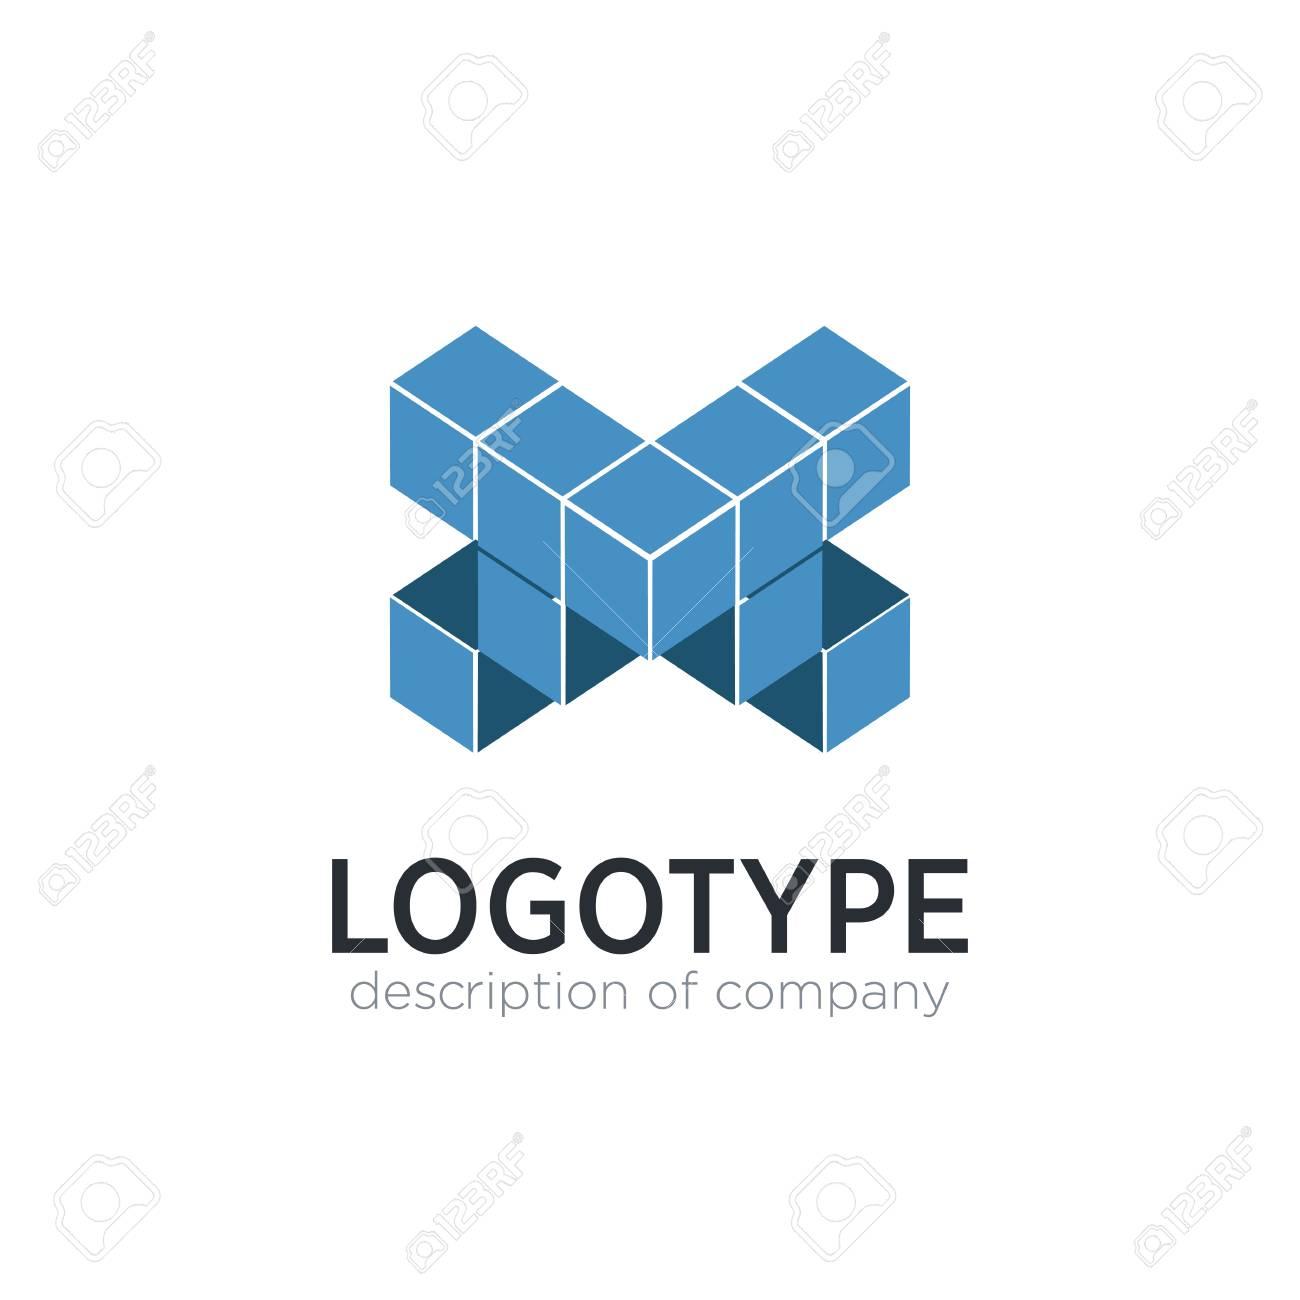 Letter X cube figure logo icon design template elements - 83859821